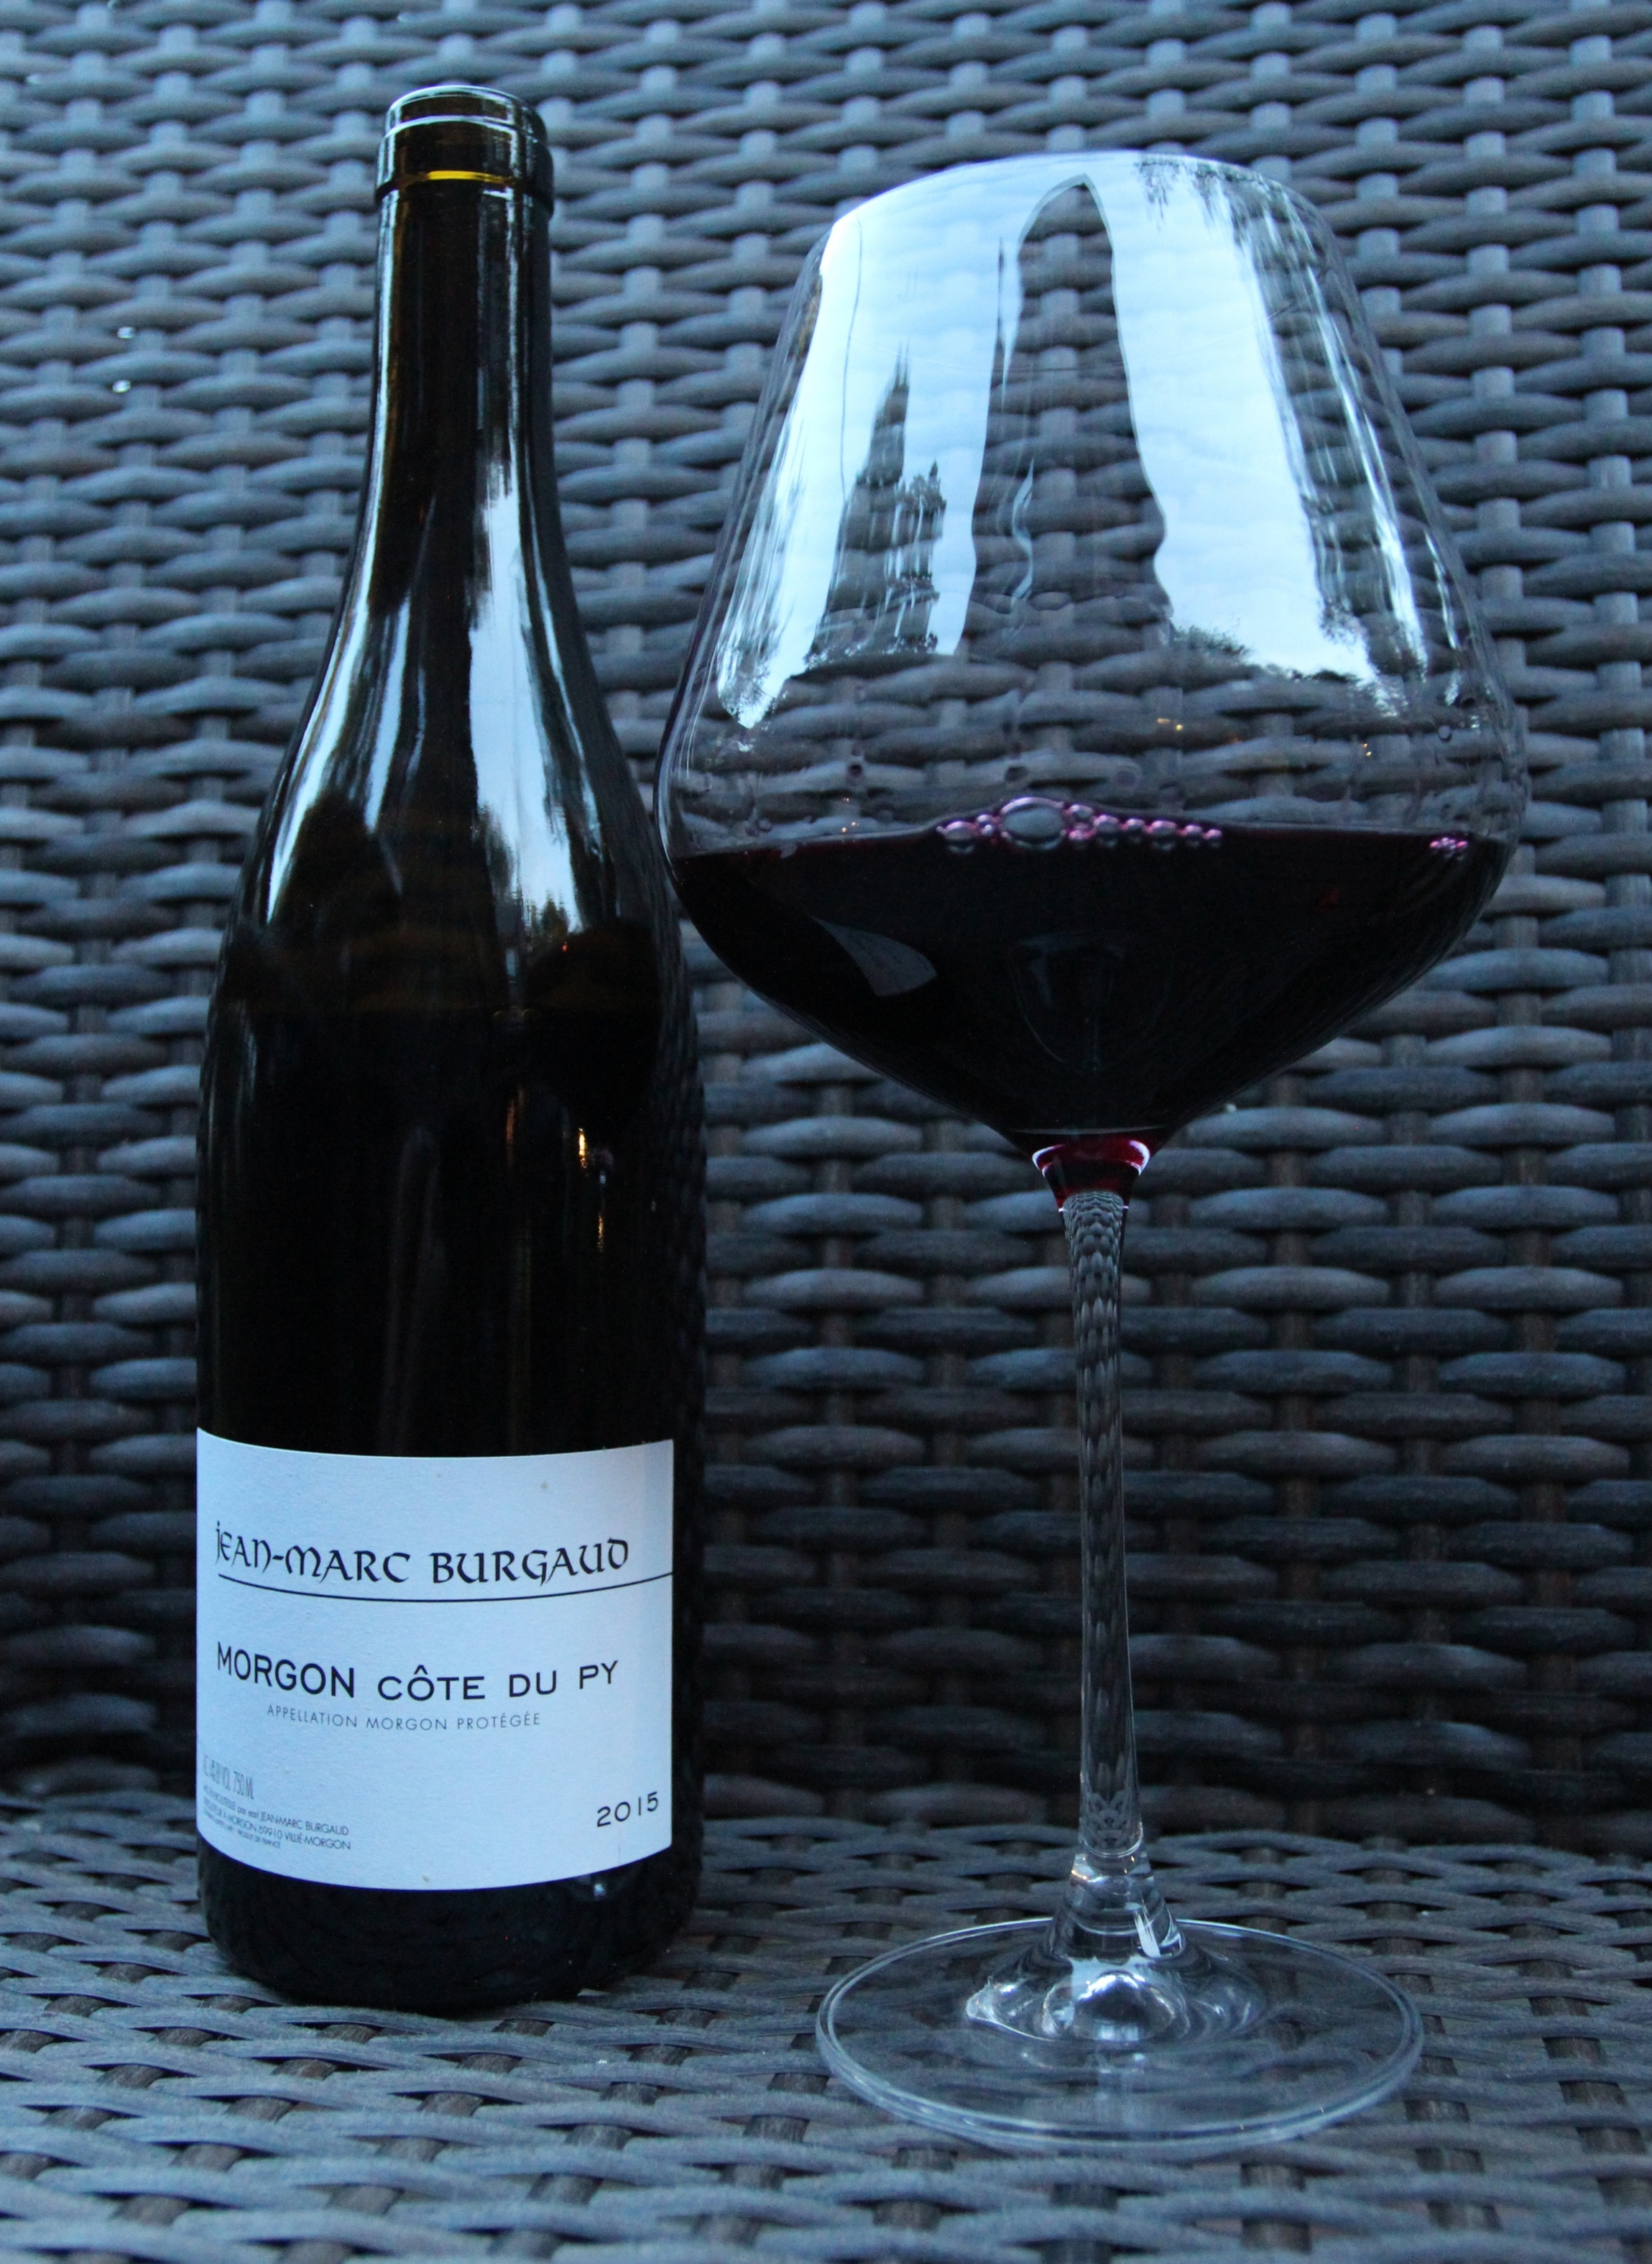 Jean-Marc Burgaud Morgon Côte du Py 2015: $19.99